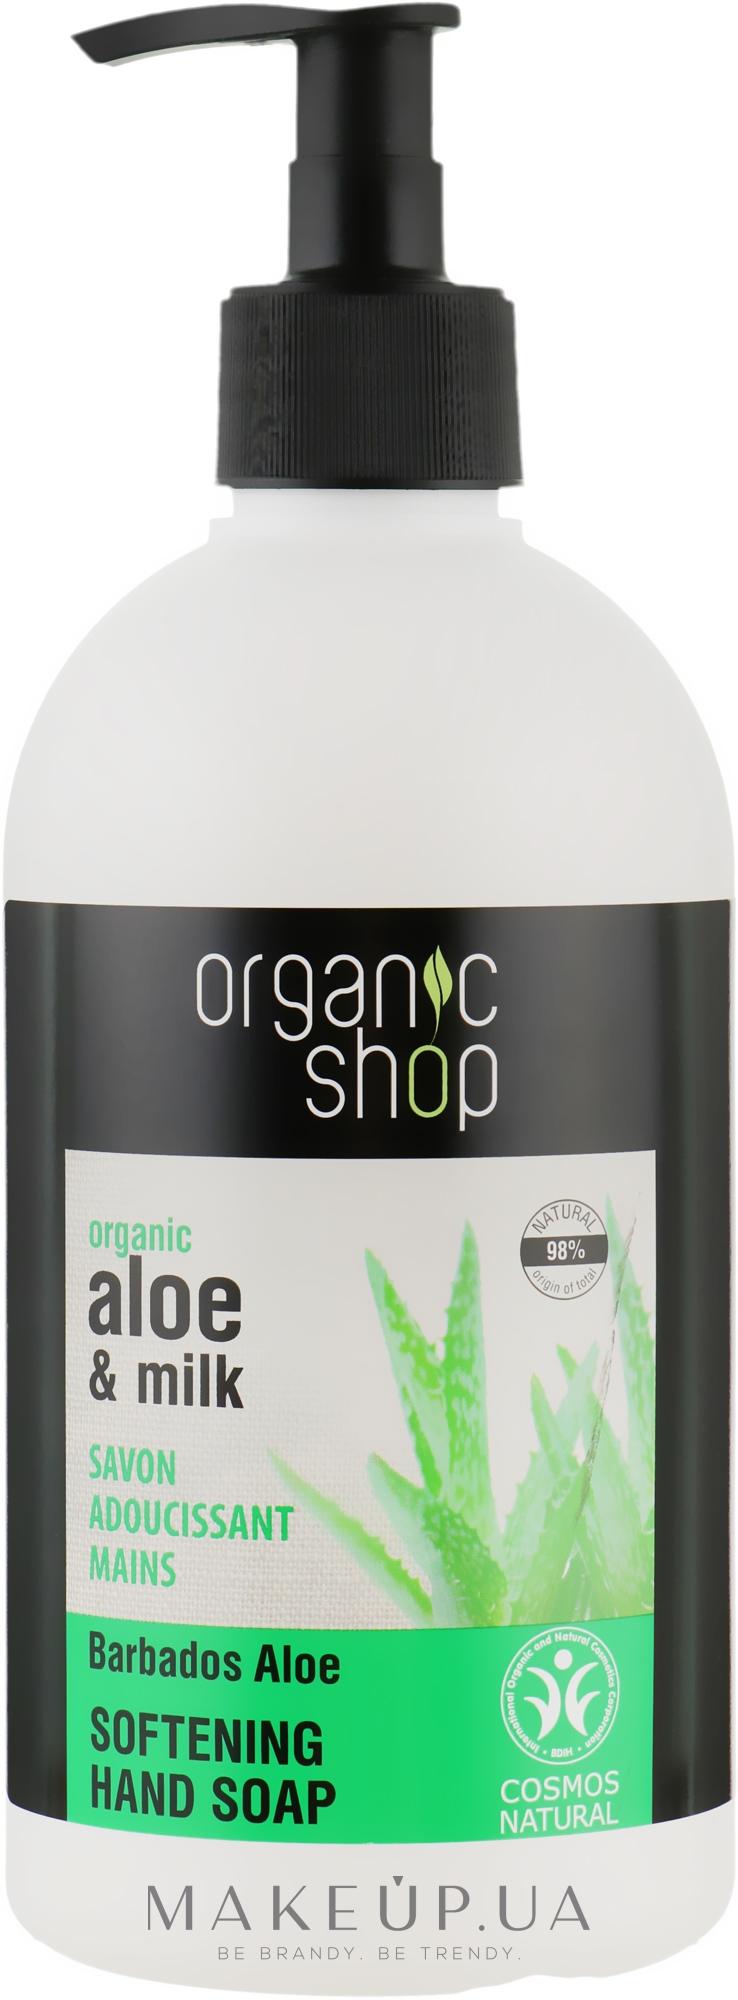 Пом'якшувальне рідке мило для рук - Organic Shop Organic Aloe Vera and Milk Hand Soap — фото 500ml